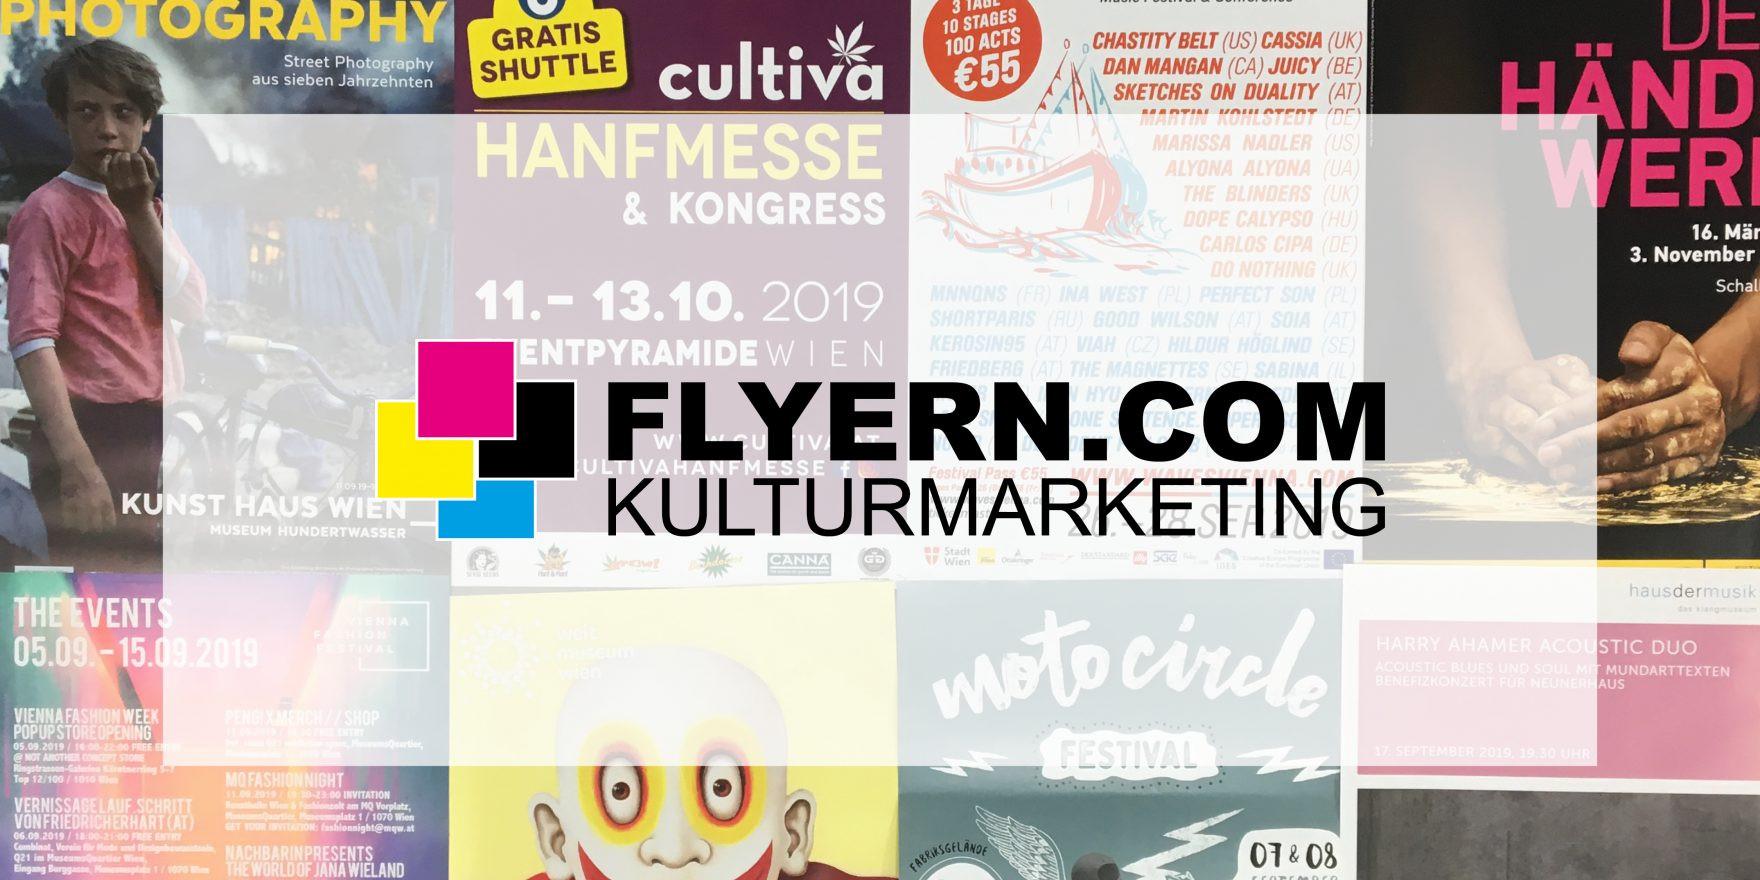 Nebenjob gesucht? Flyern.com sucht Verstärkung!